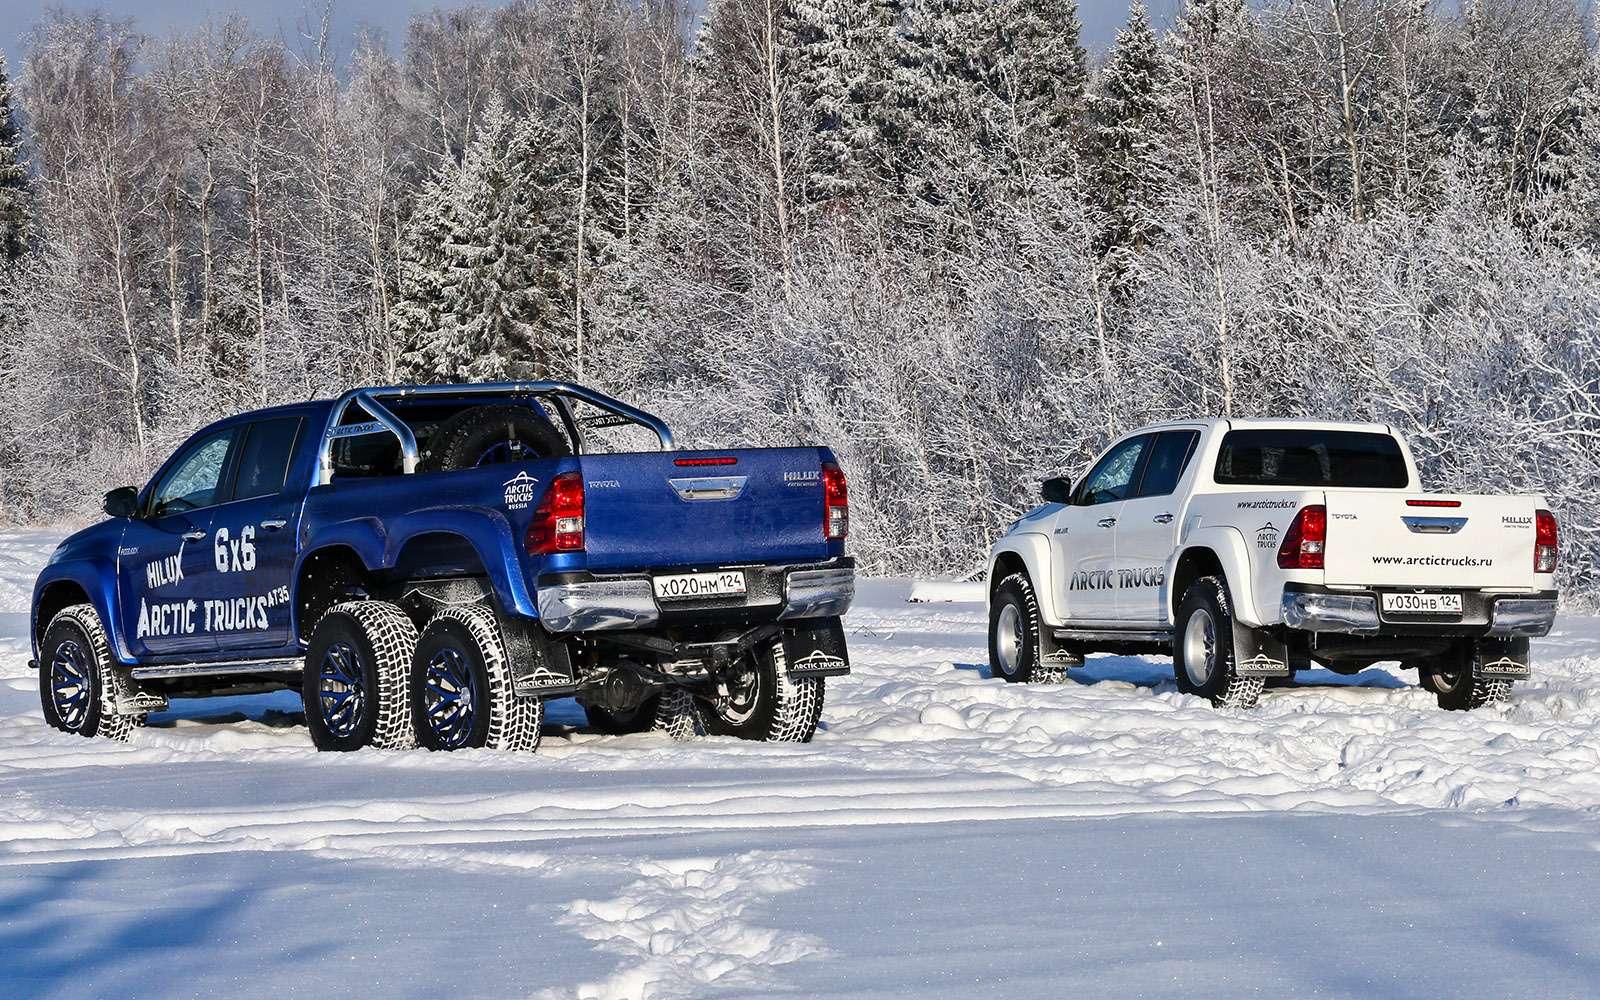 Пикапы Toyota Hilux Arctic Trucks: 4х4или 6х6?— фото 745678